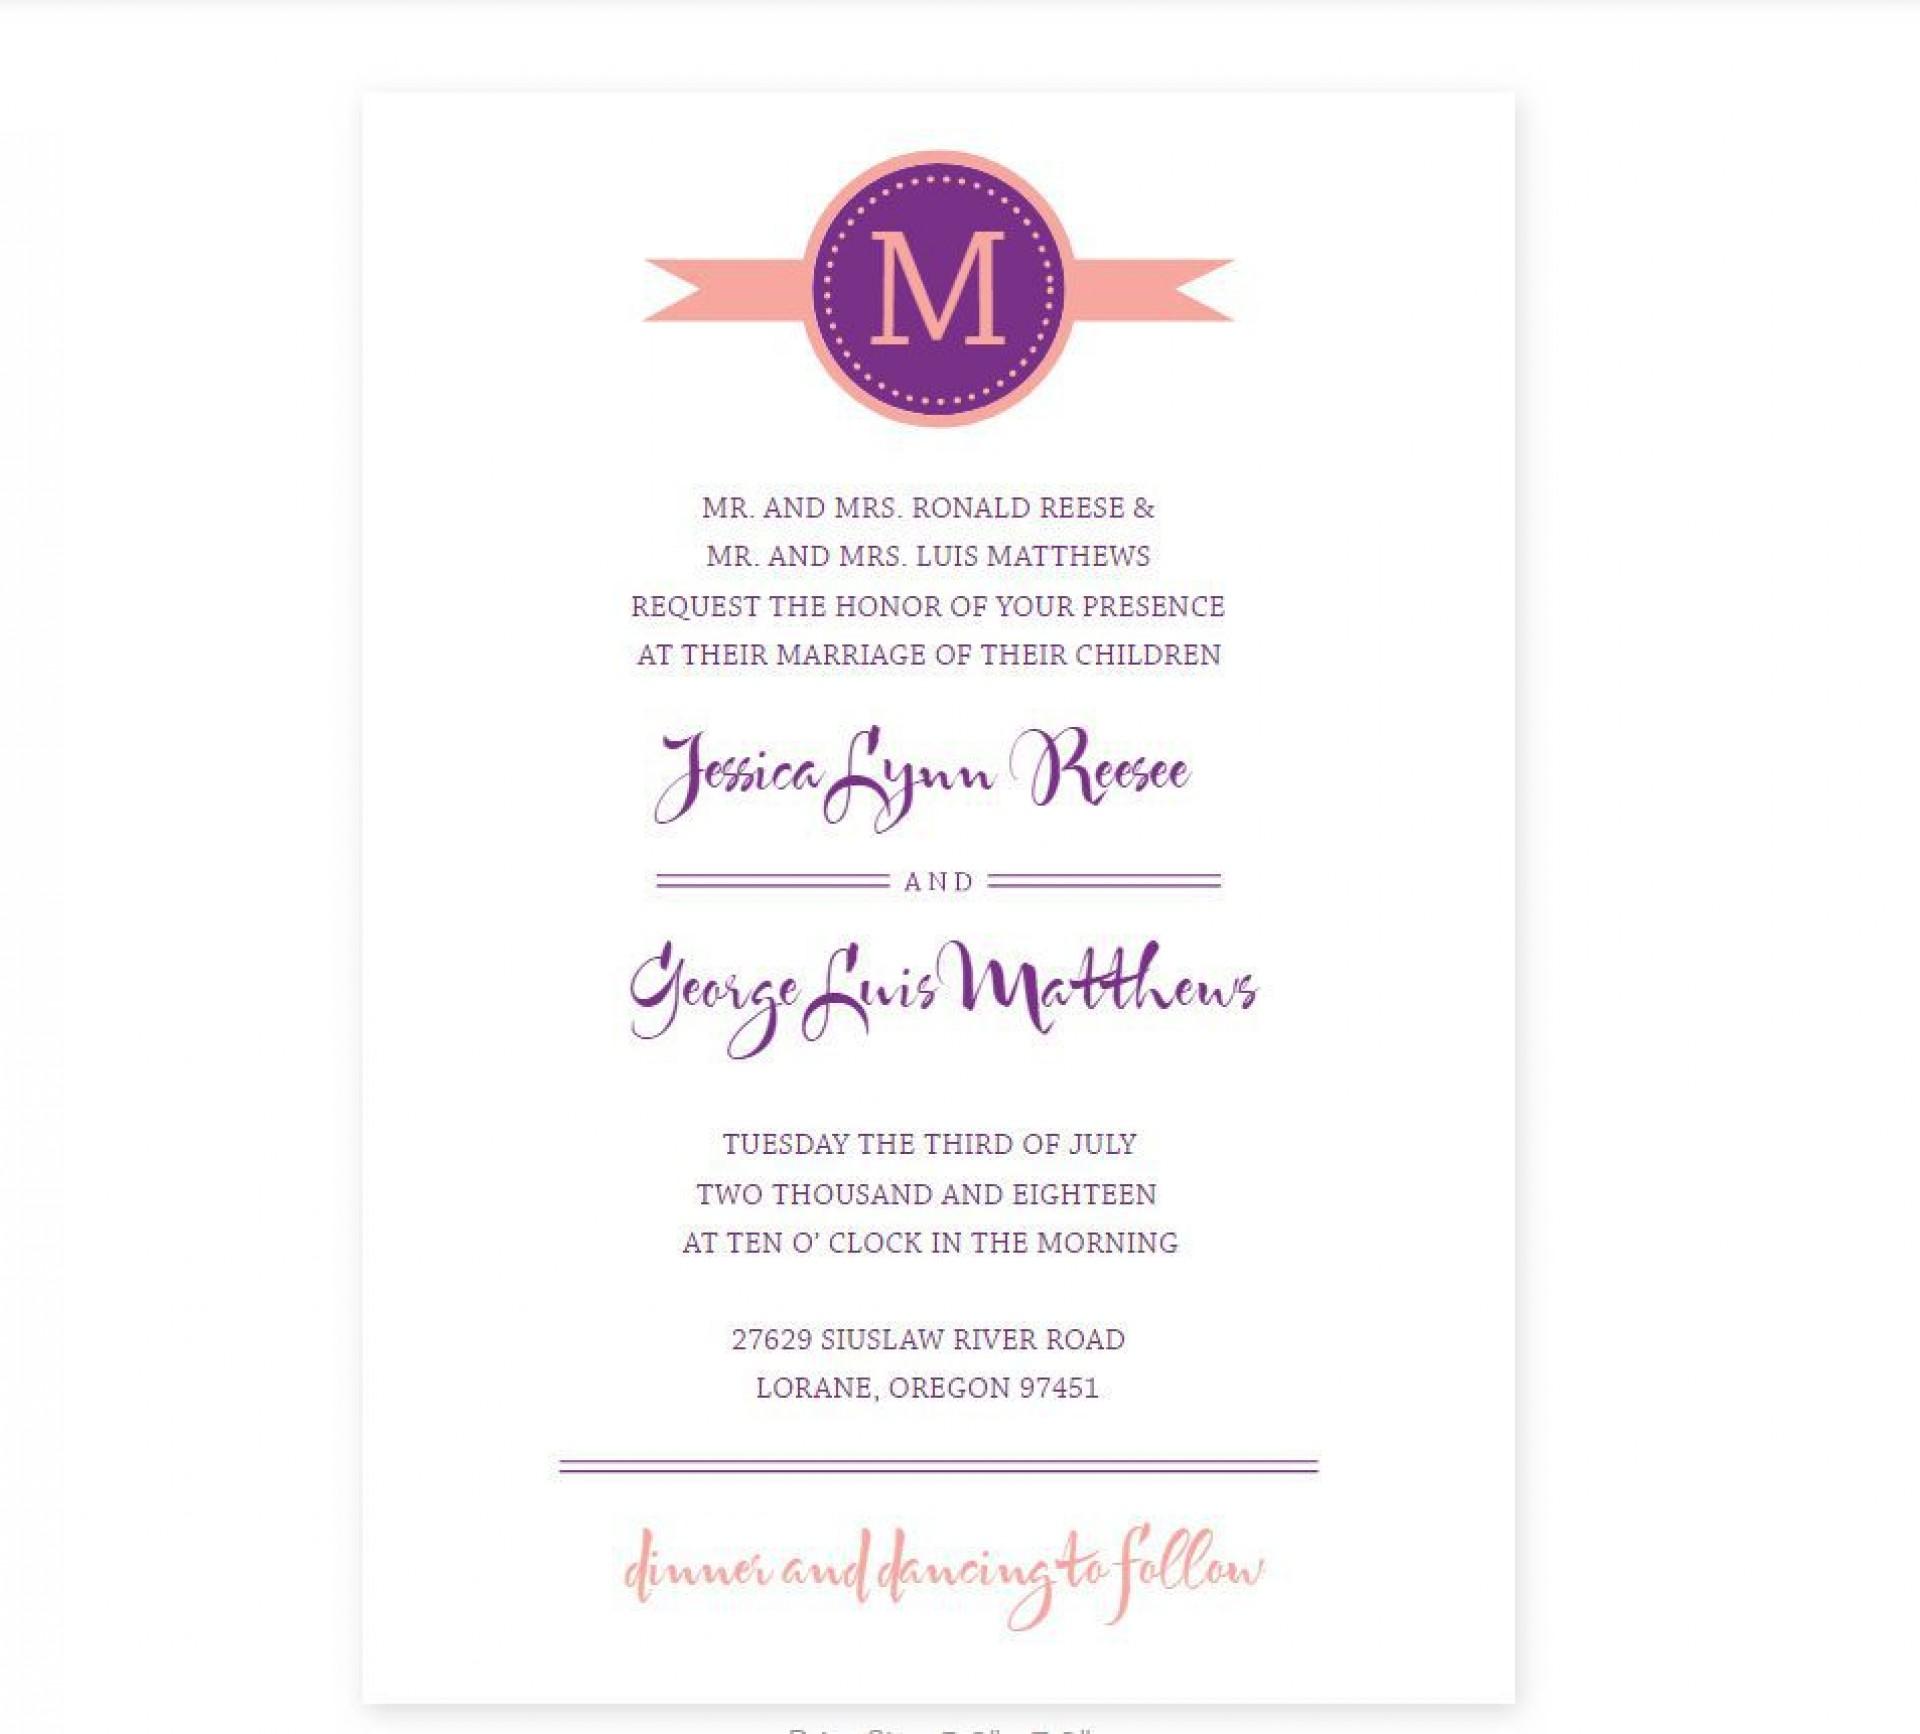 008 Simple Wedding Program Template Free Photo  Fan Download Elegant1920